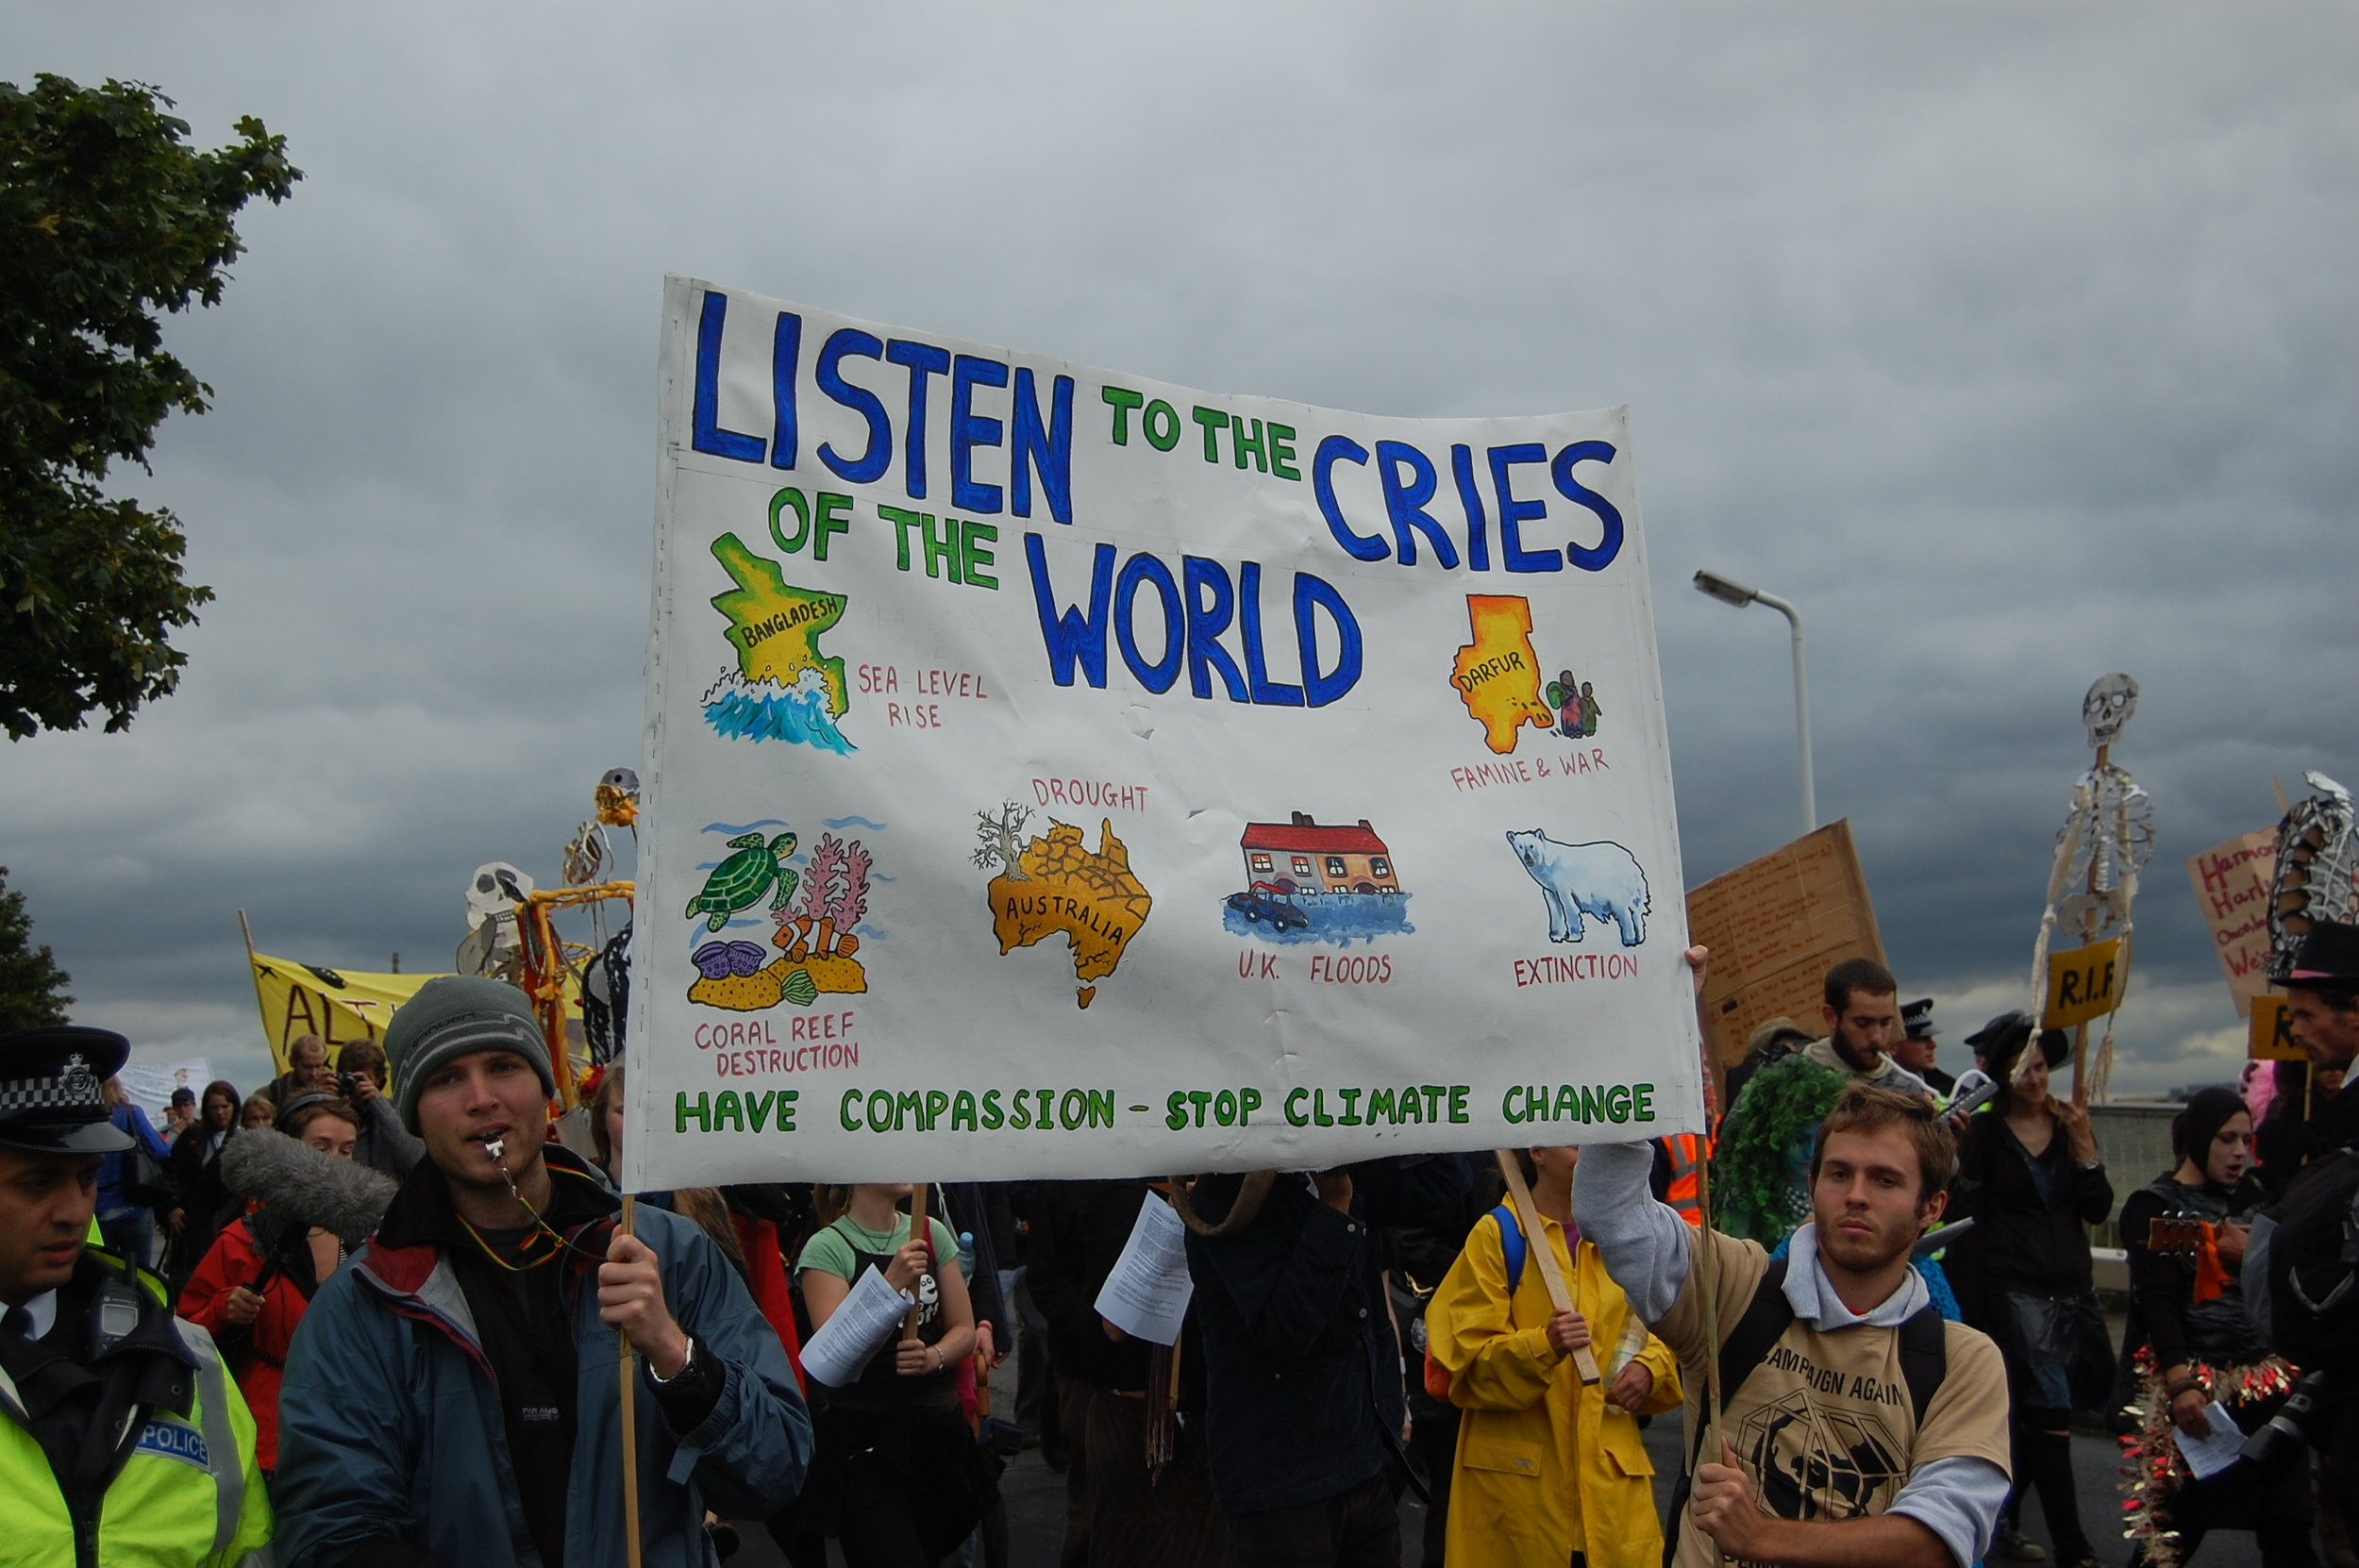 halt climate change debate - HD1162×876